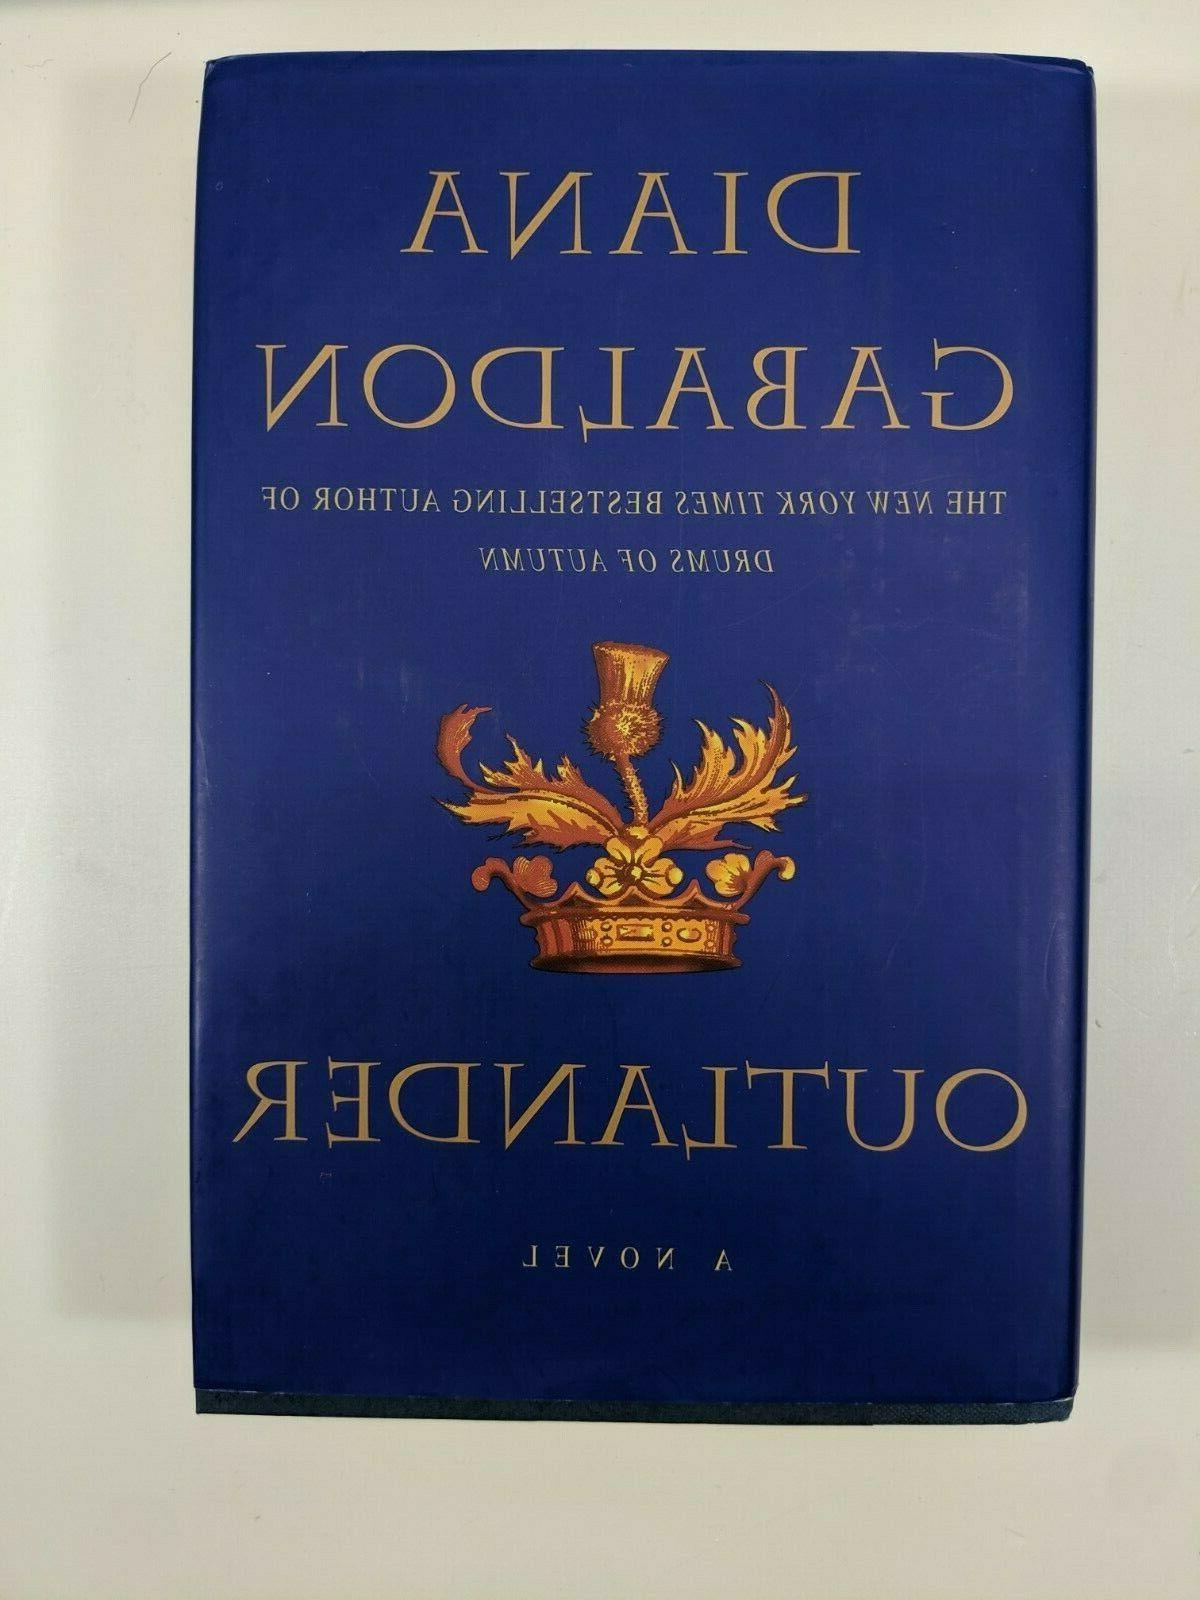 outlander book 1 of the outlander series